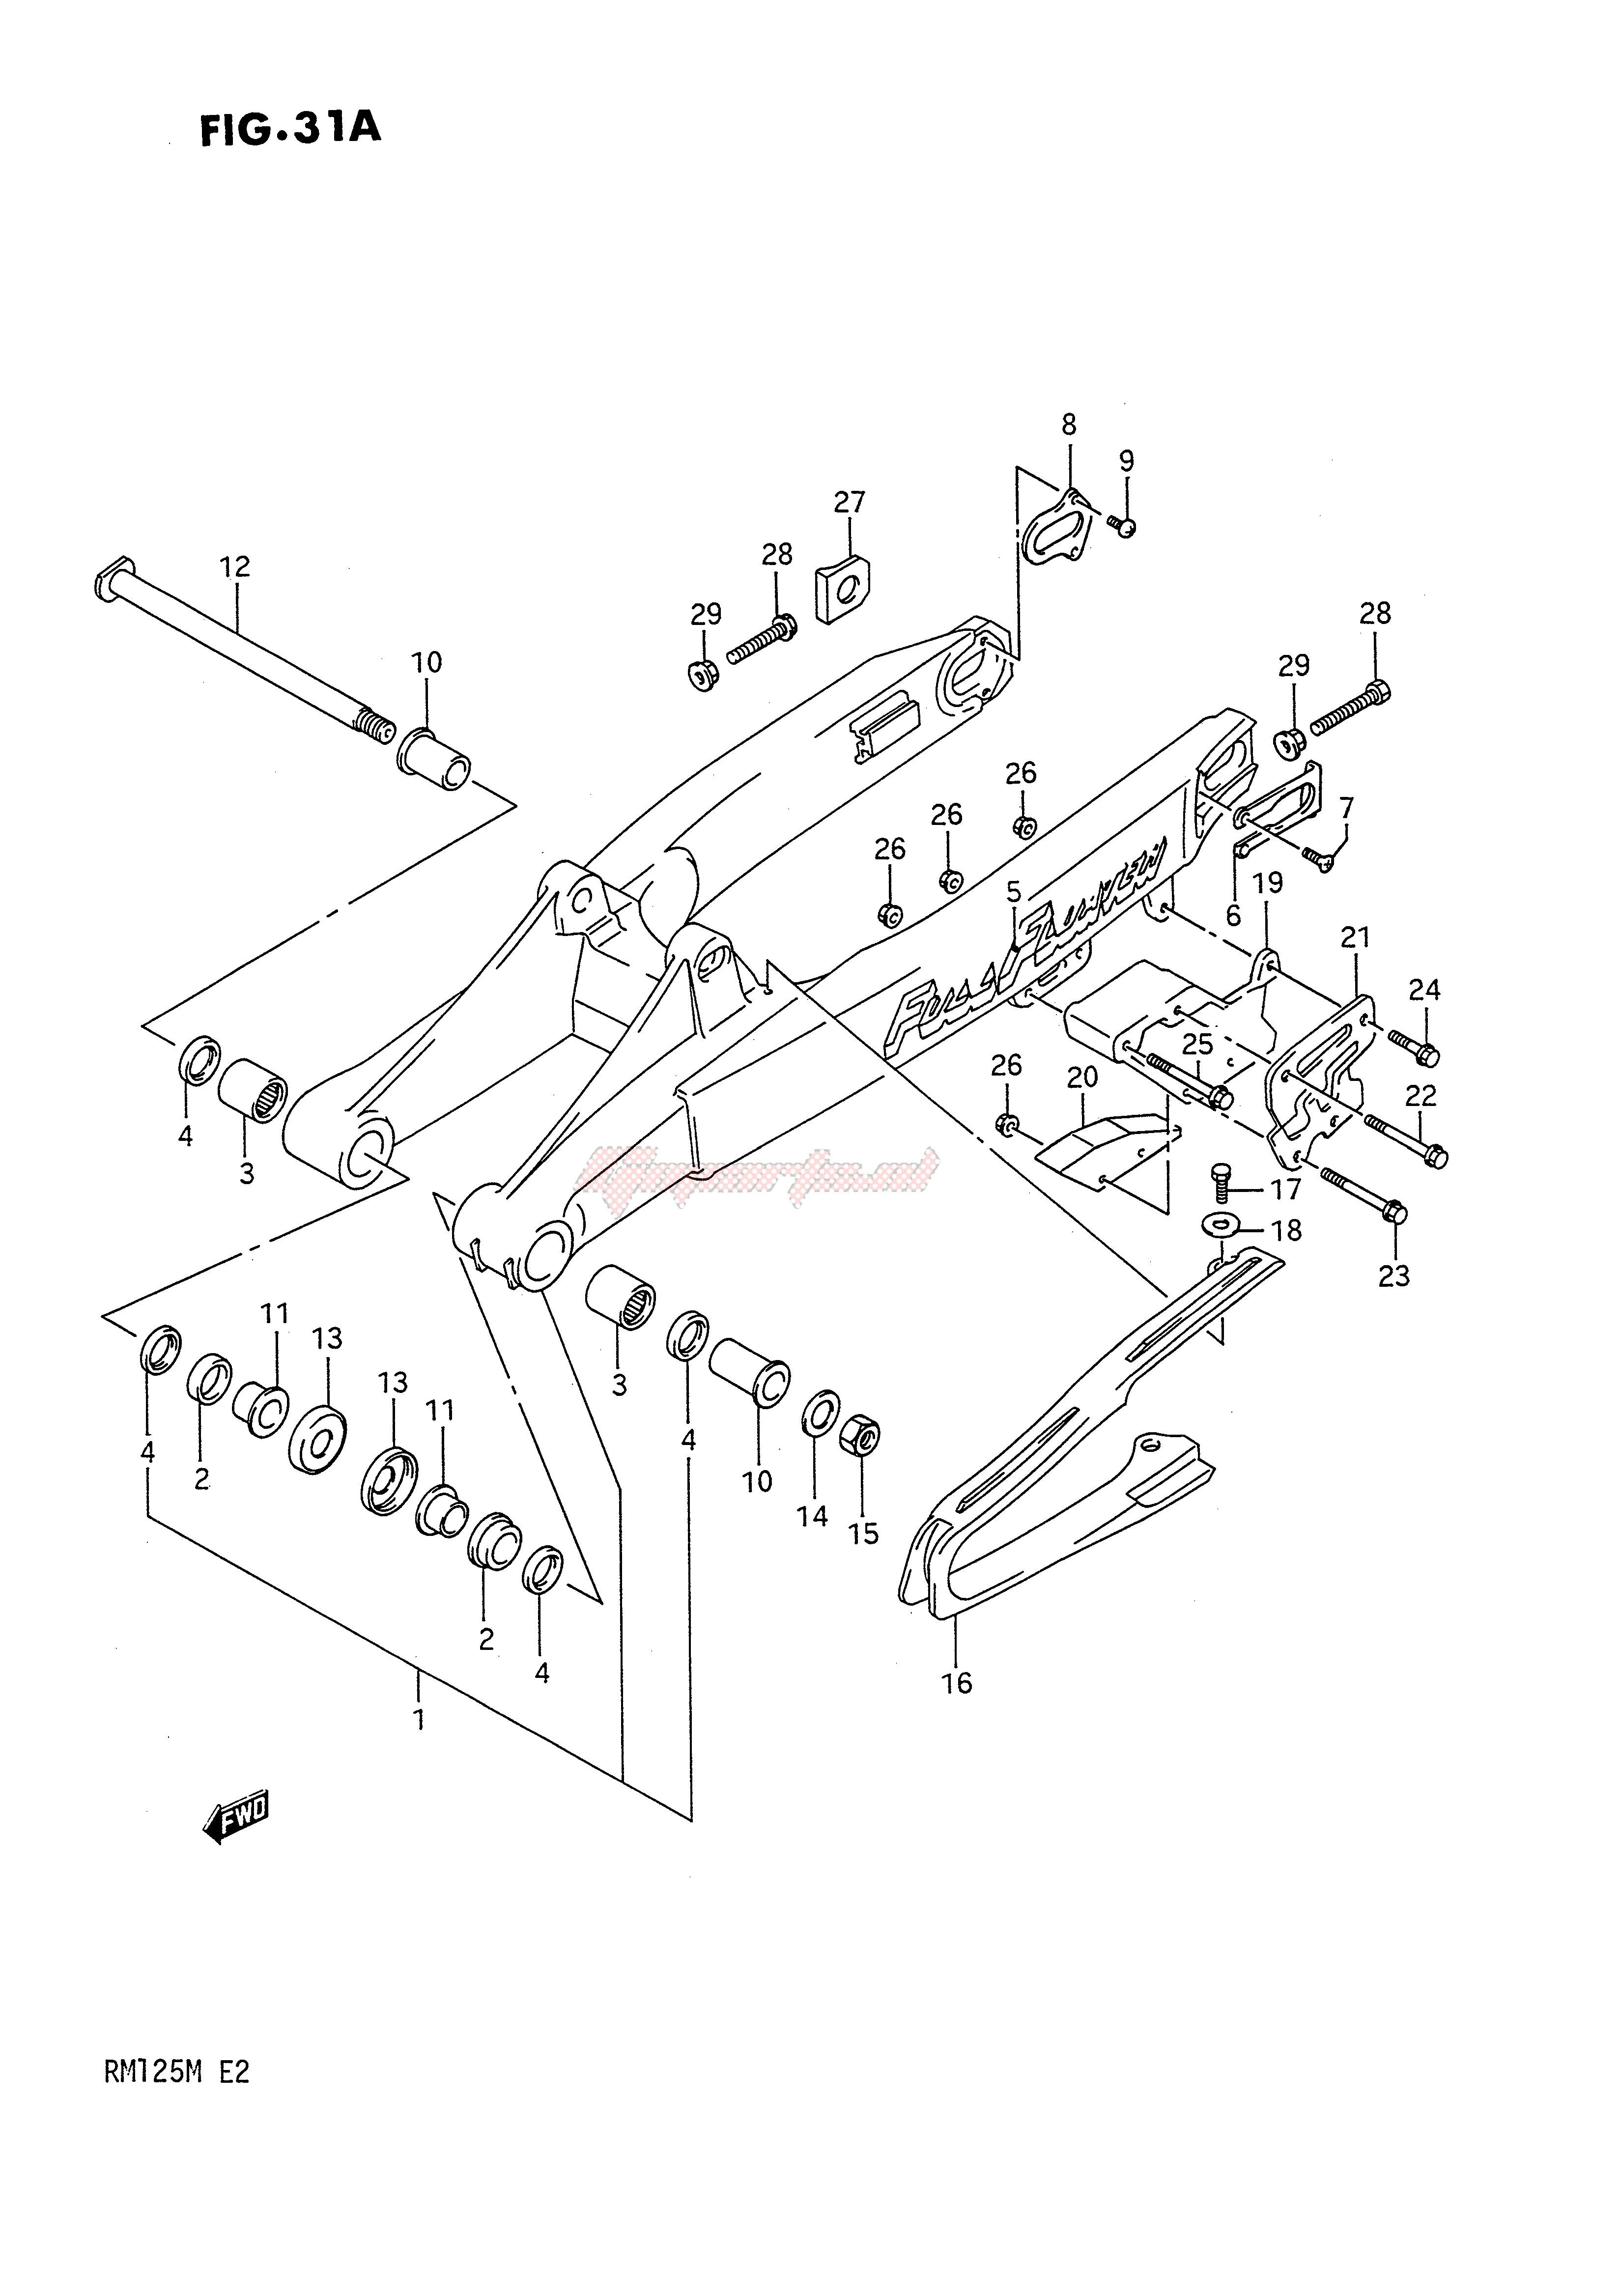 REAR SWINGING ARM (MODEL L) blueprint